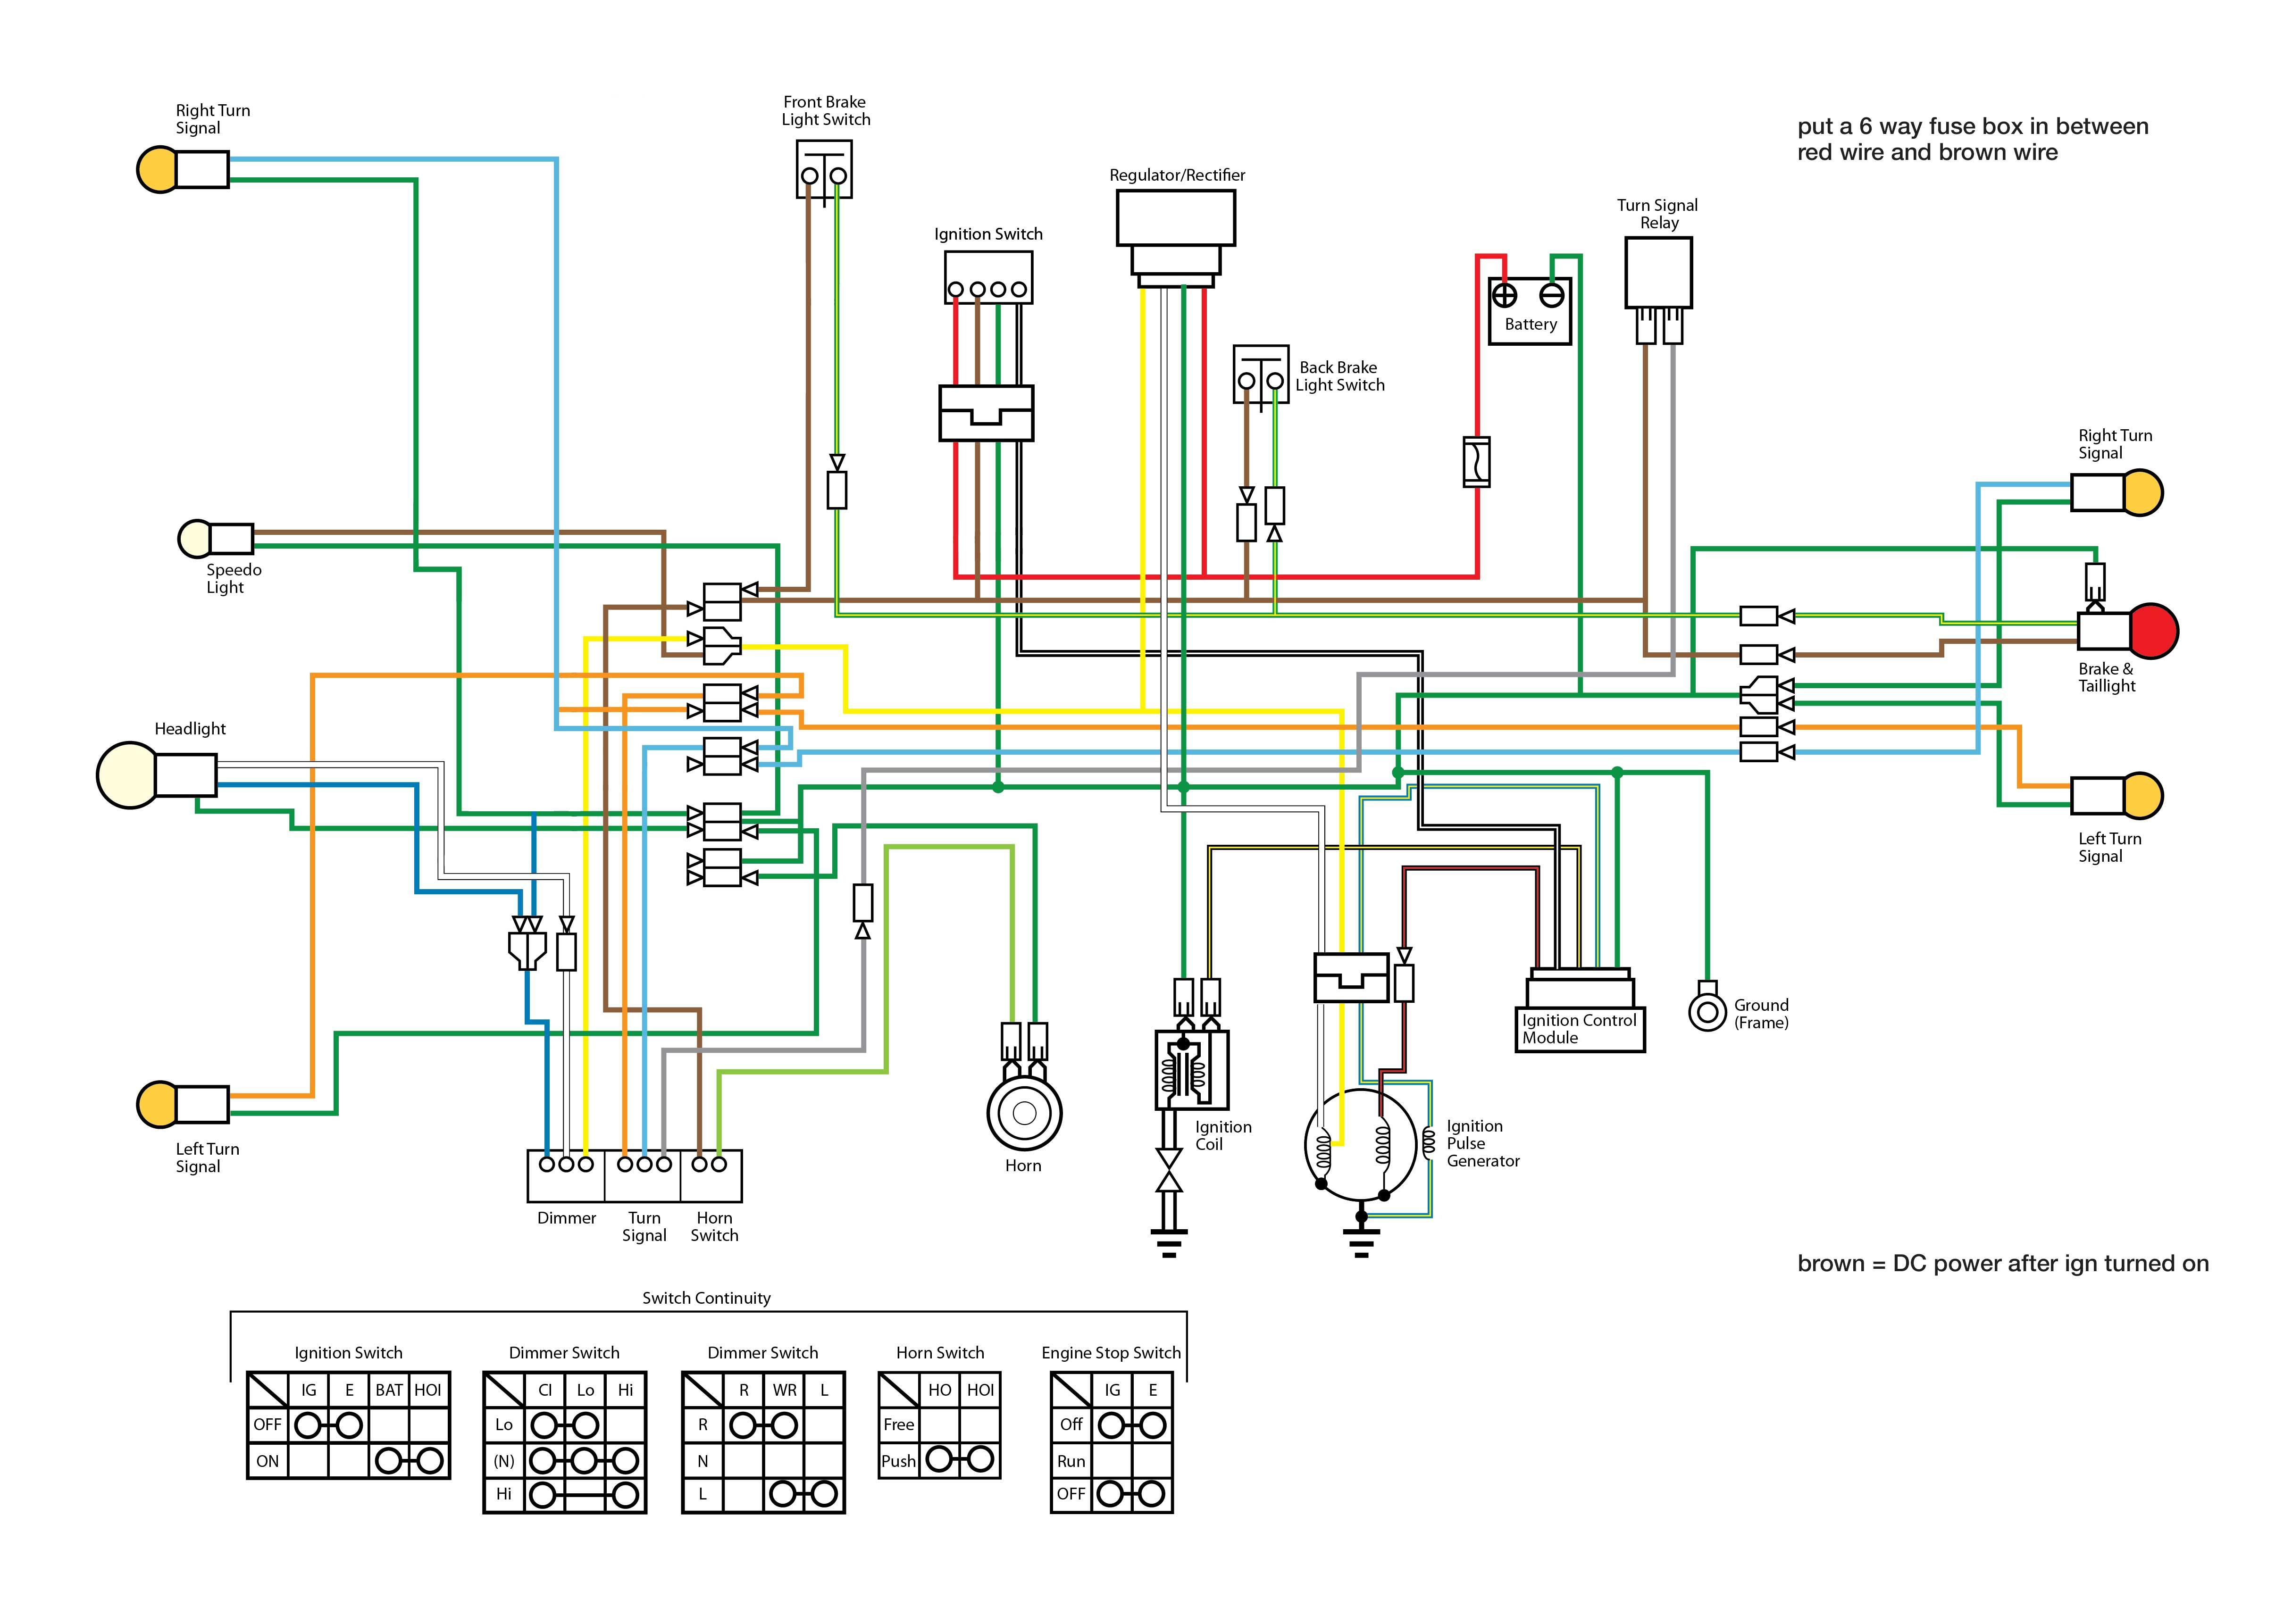 Lifan 90cc Wiring Diagram - 2002 Subaru Forester Fuse Box -  polarisss.ati-loro.jeanjaures37.frWiring Diagram Resource